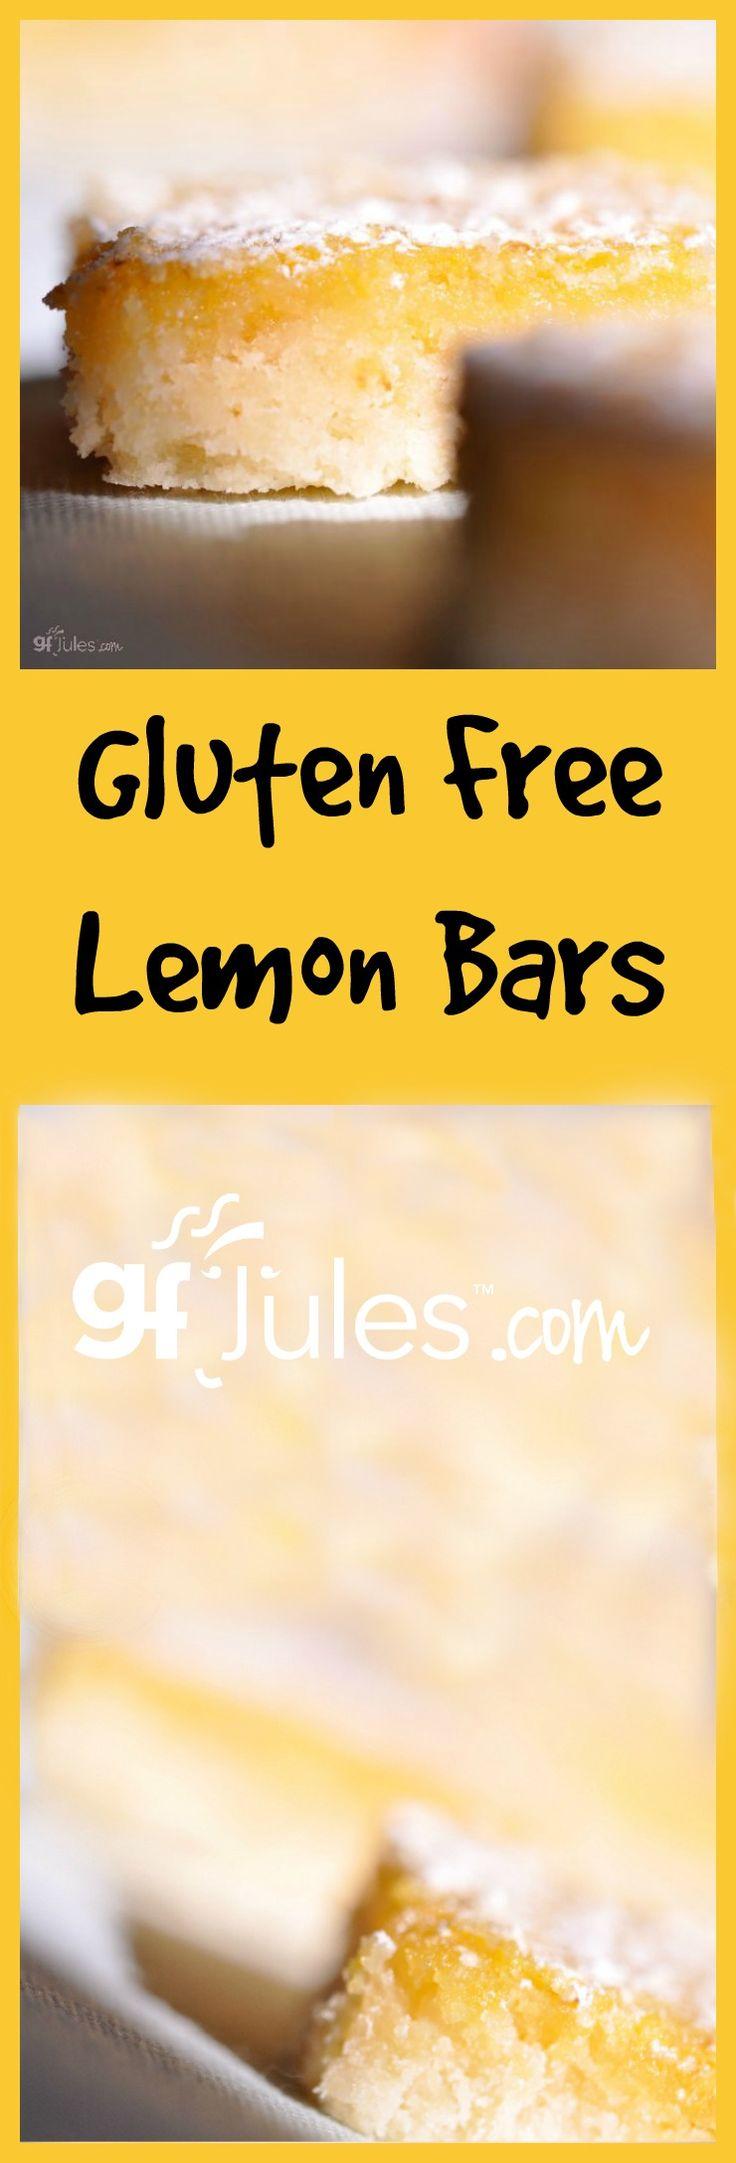 Spring in a bar cookie: Gluten Free Lemon Bars! Dairy free, too! | gfJules.com